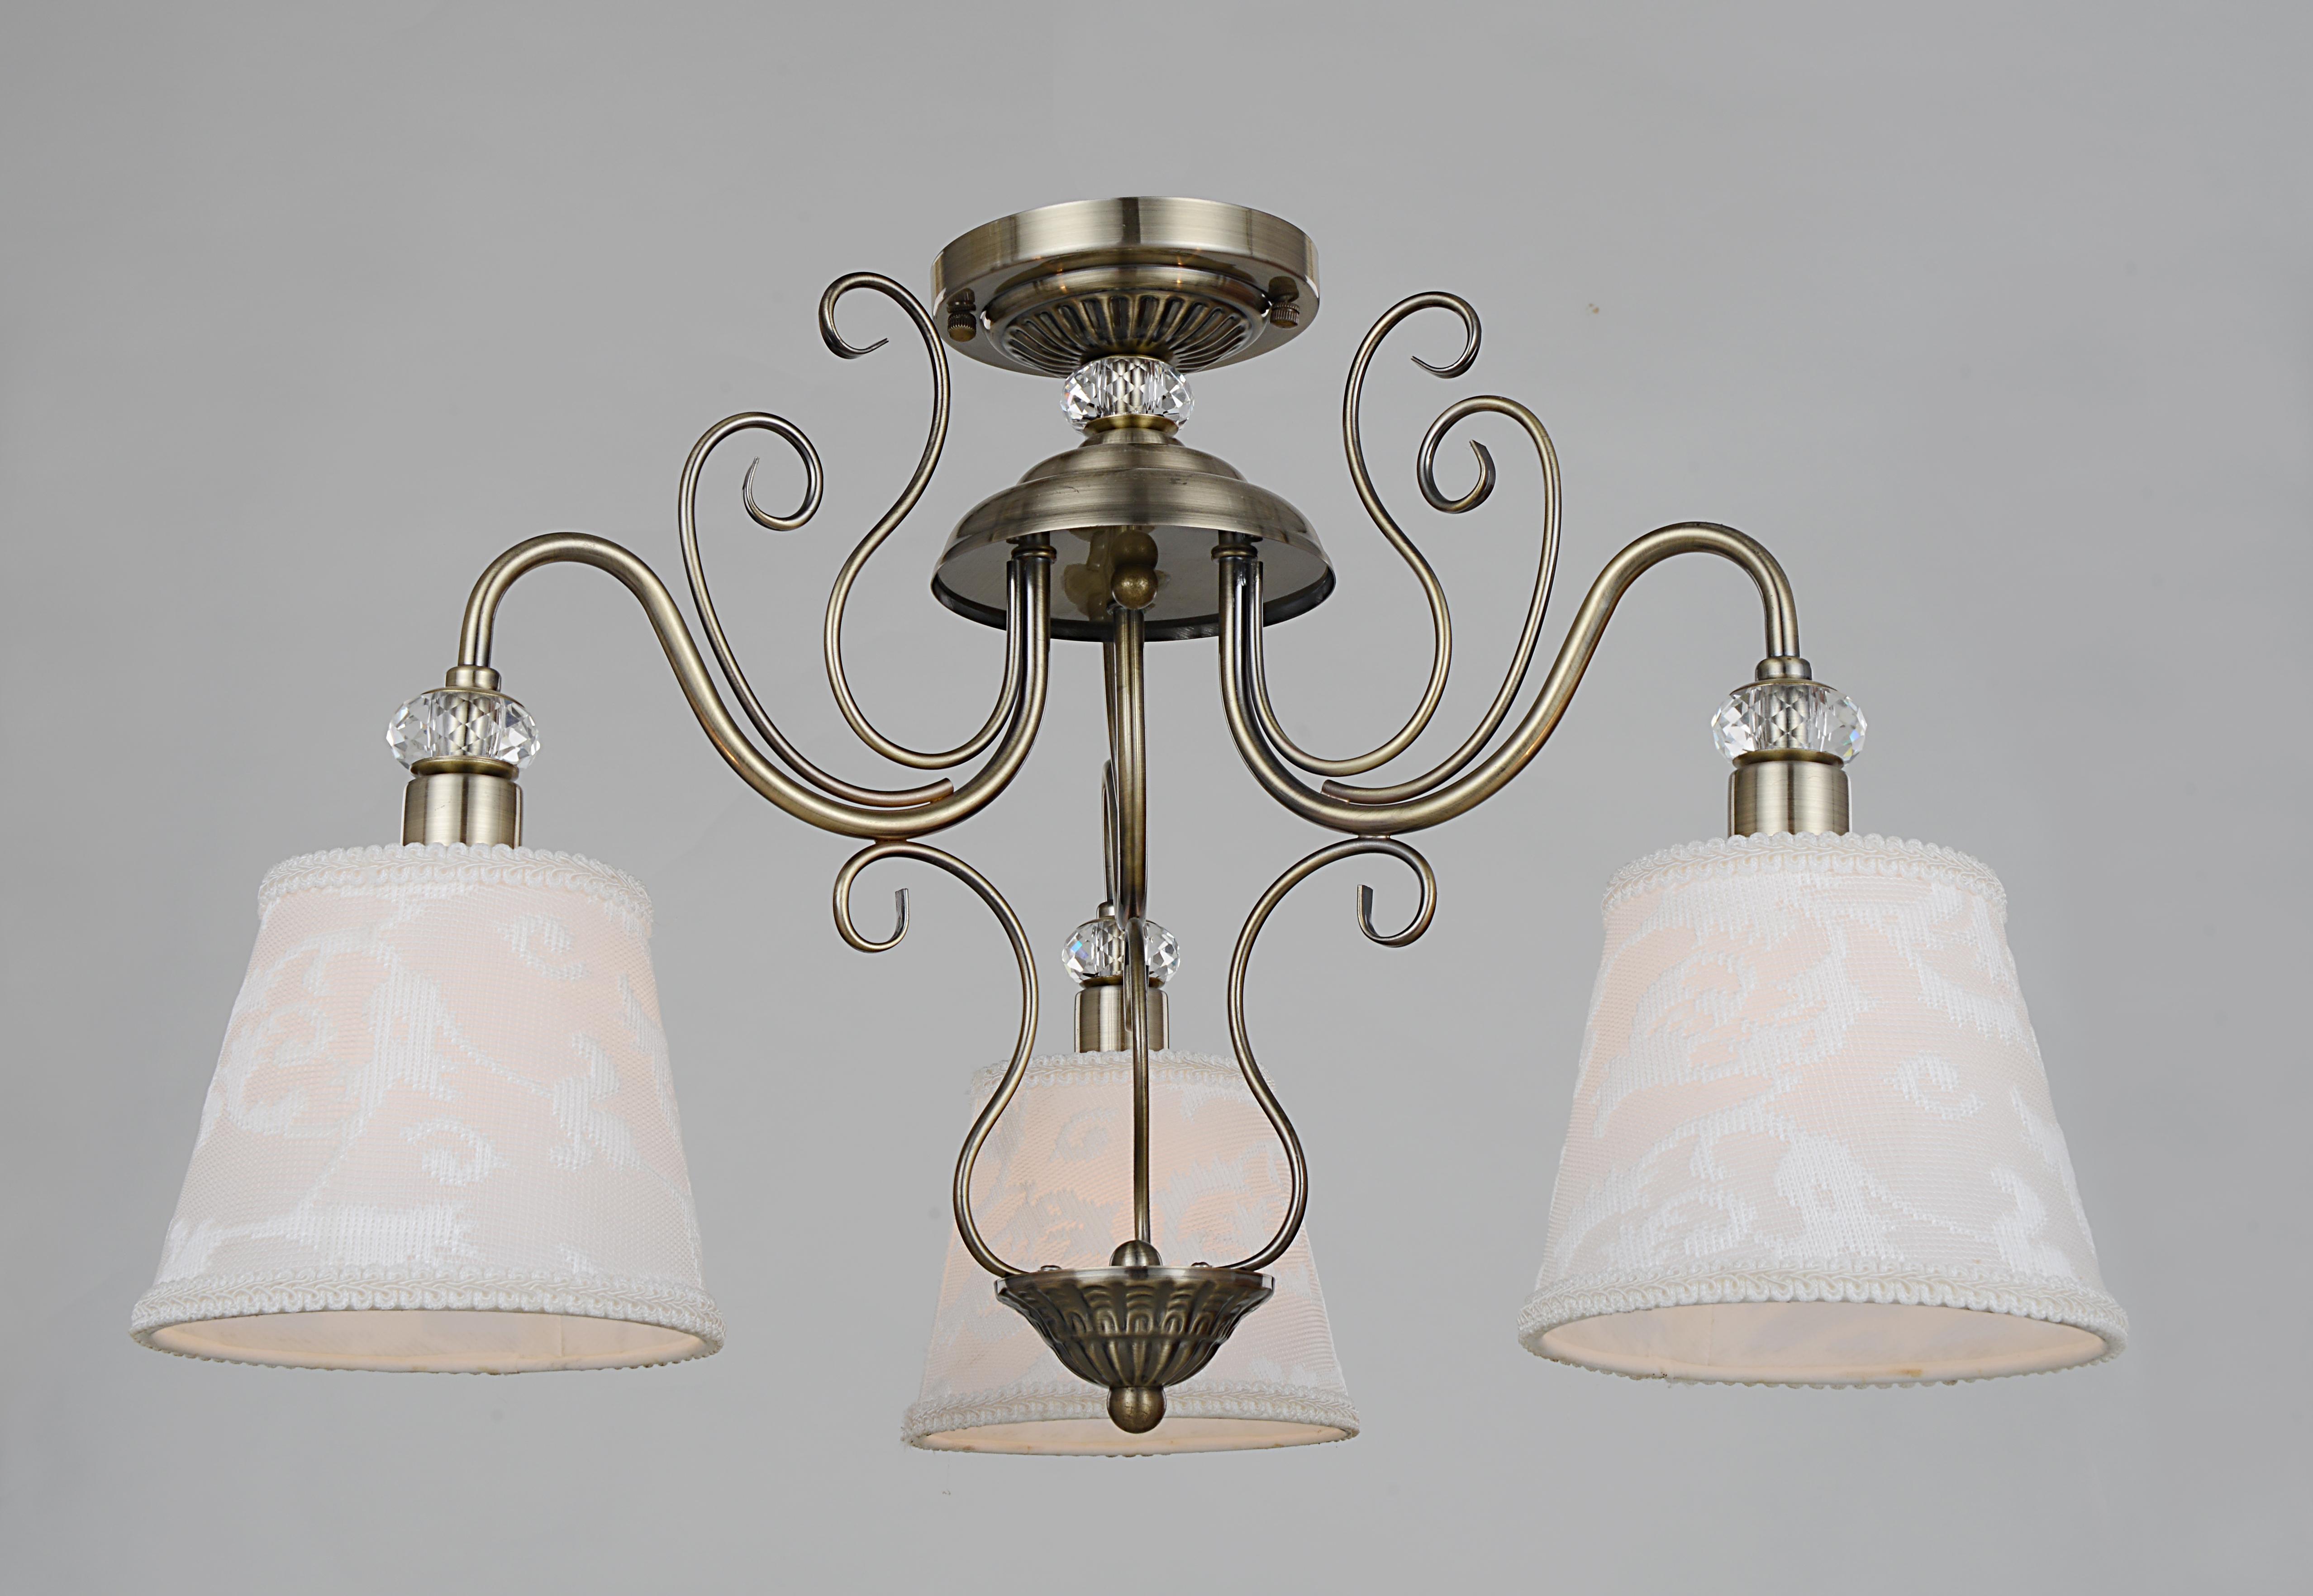 Люстра Lamplandia 5678-3 voyage люстра lamplandia daria 3х40вт е14 металл темно коричневый